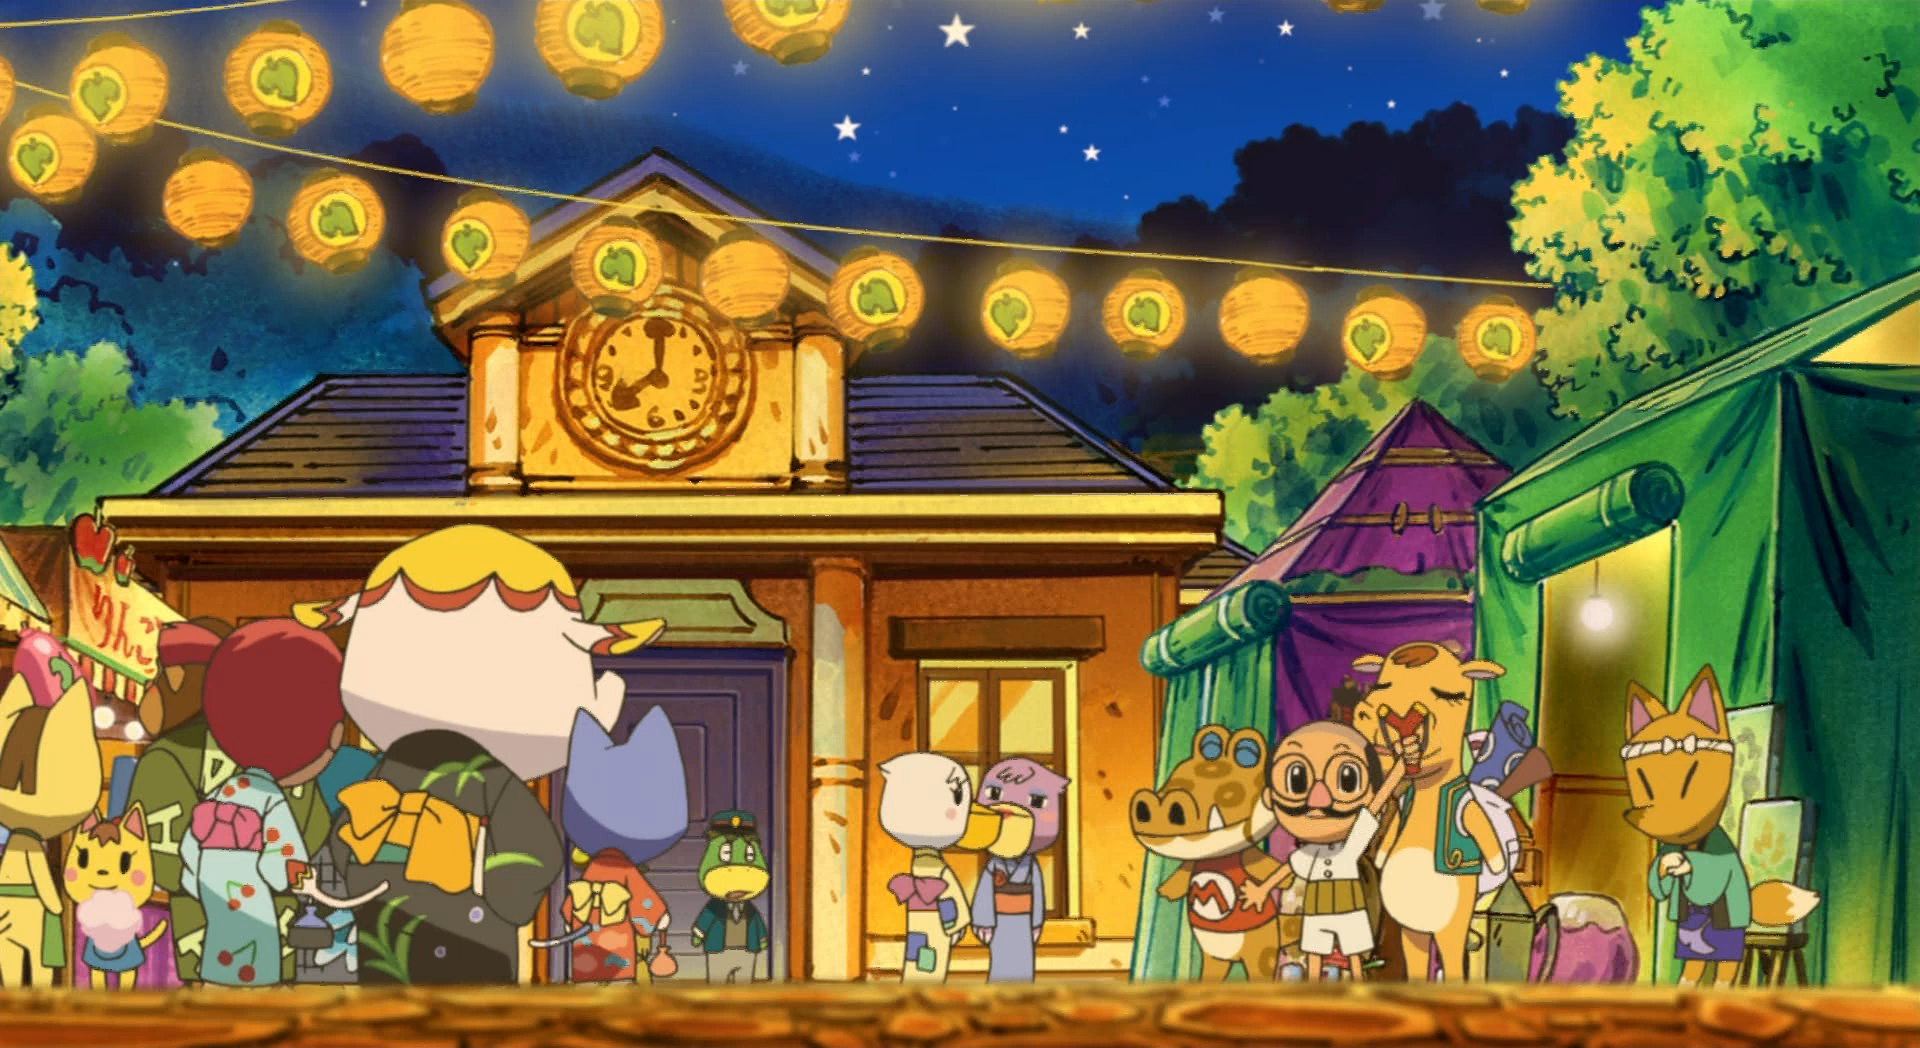 Free Download Animal Crossing 1080p Grohotun S Hd Anime Grohotun S